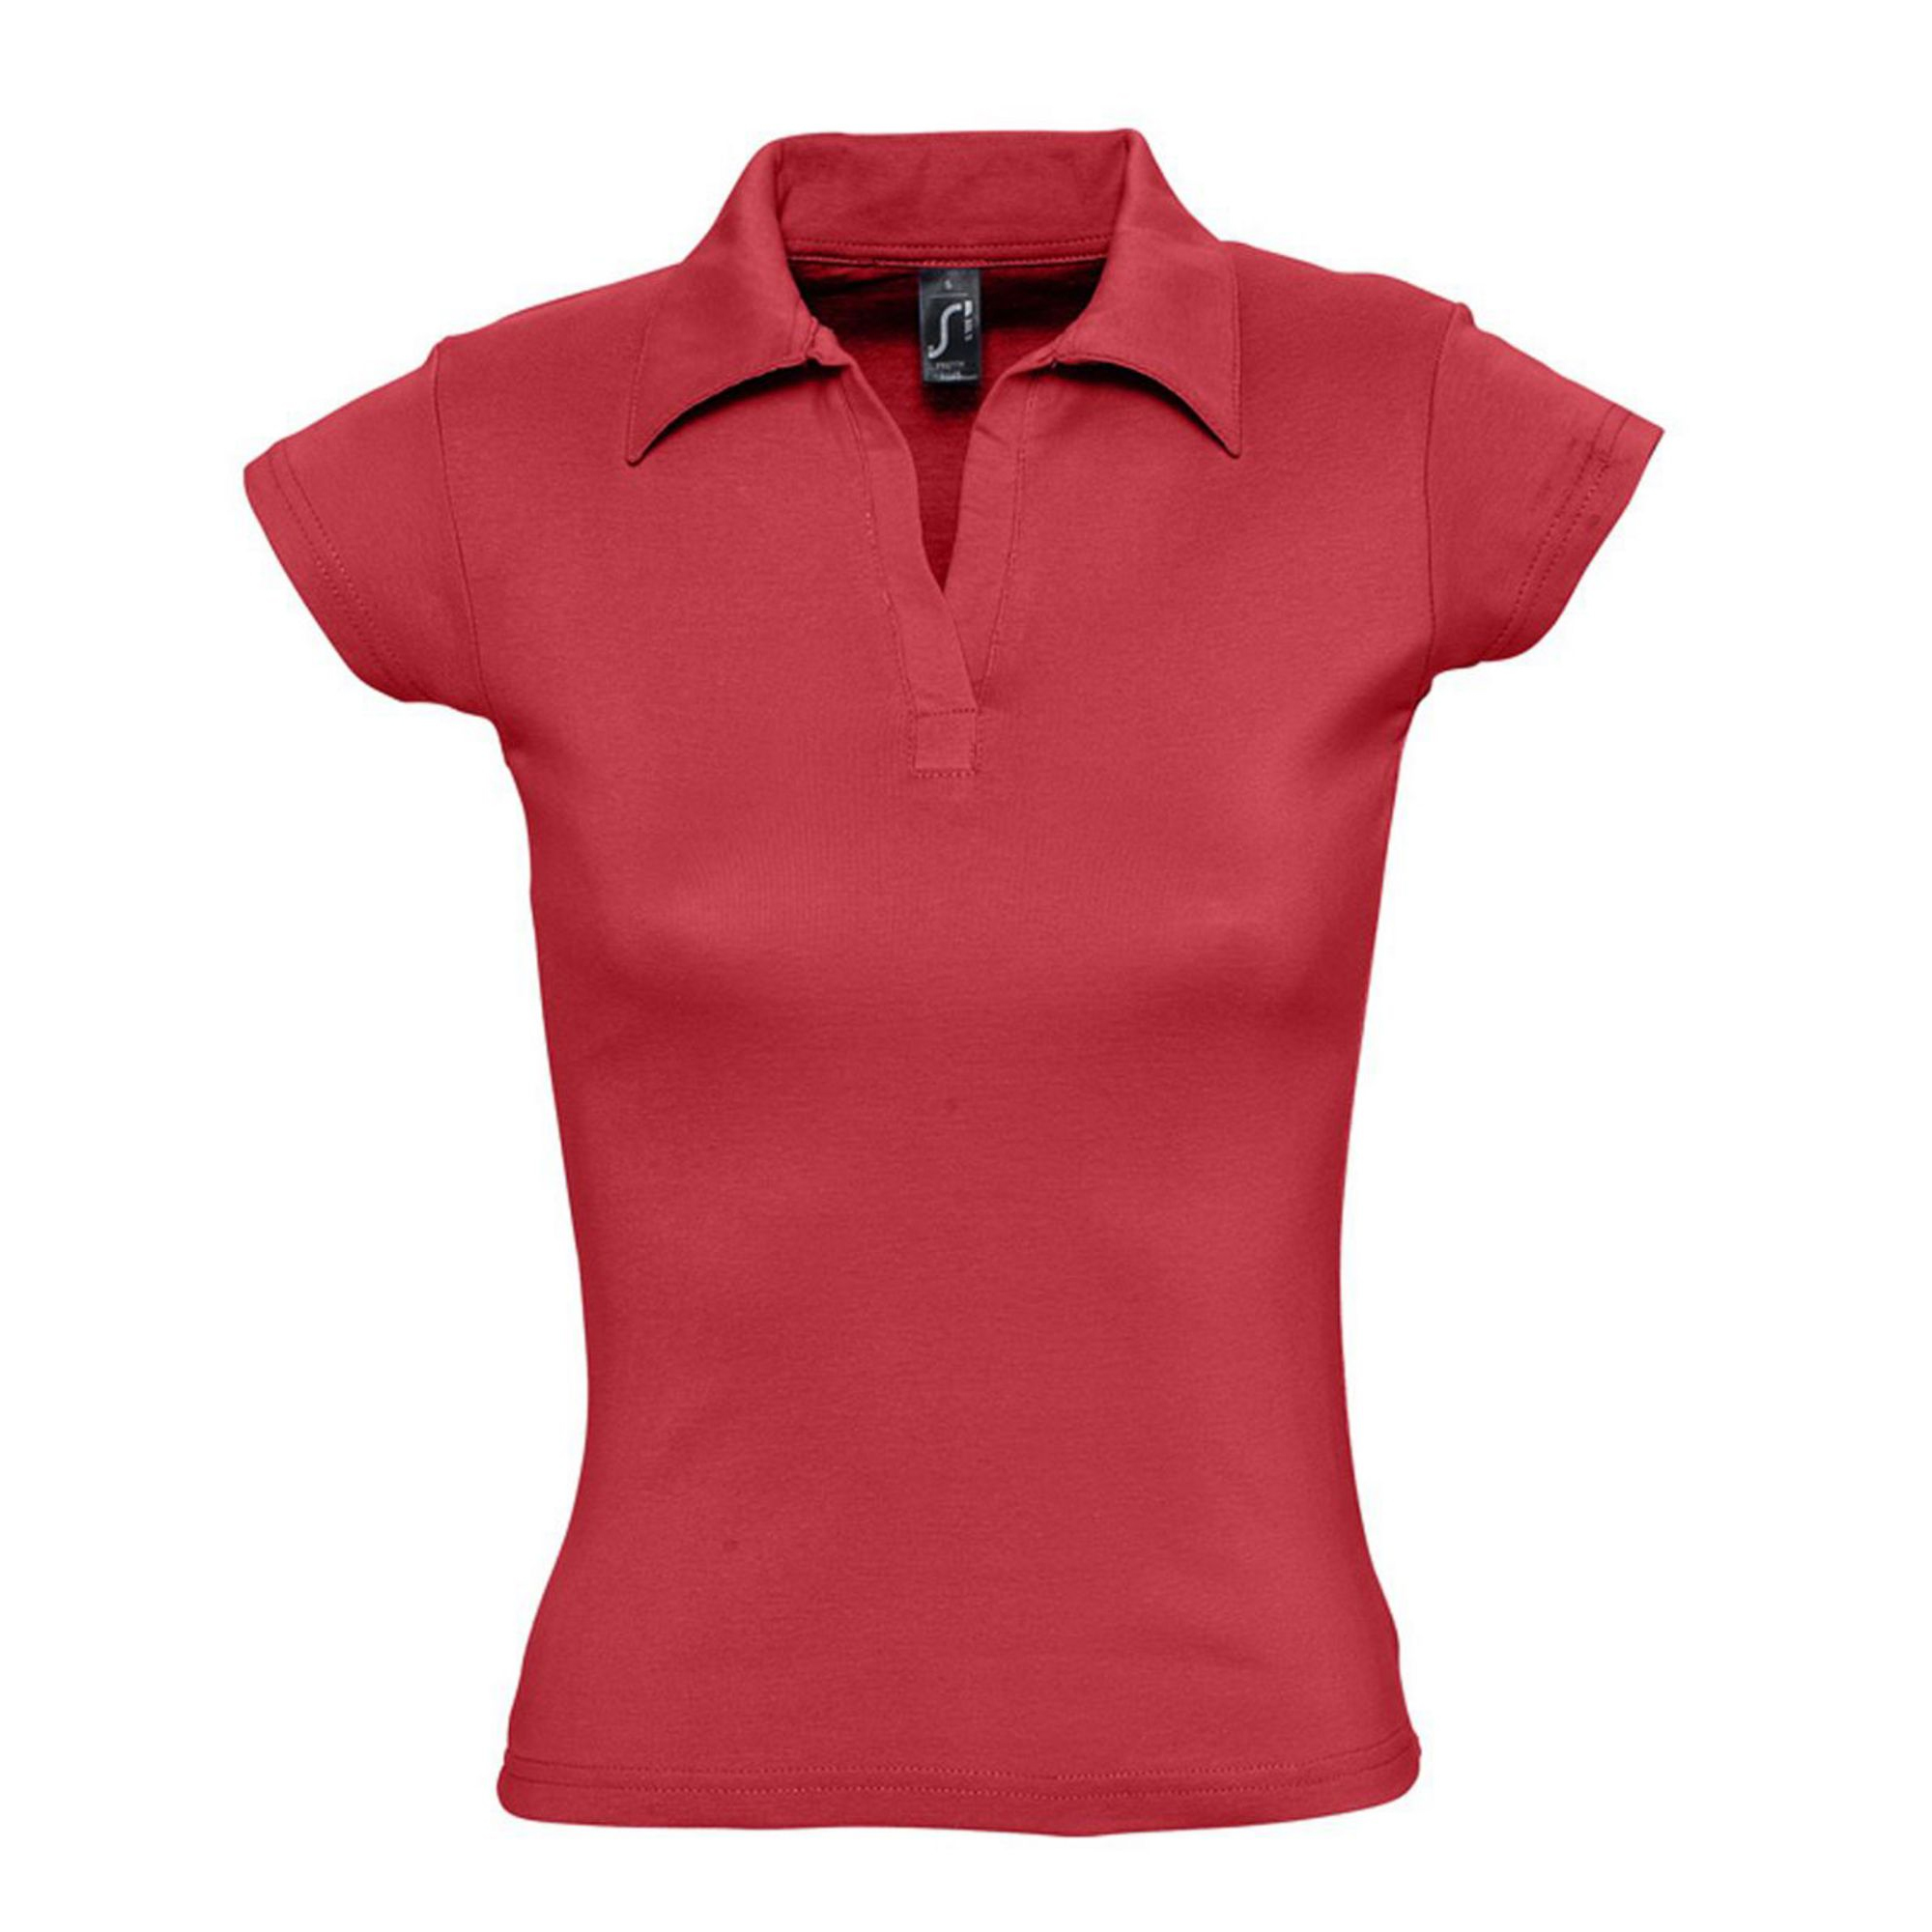 Рубашка поло женская без пуговиц красная PRETTY. арт. 1835 SALE